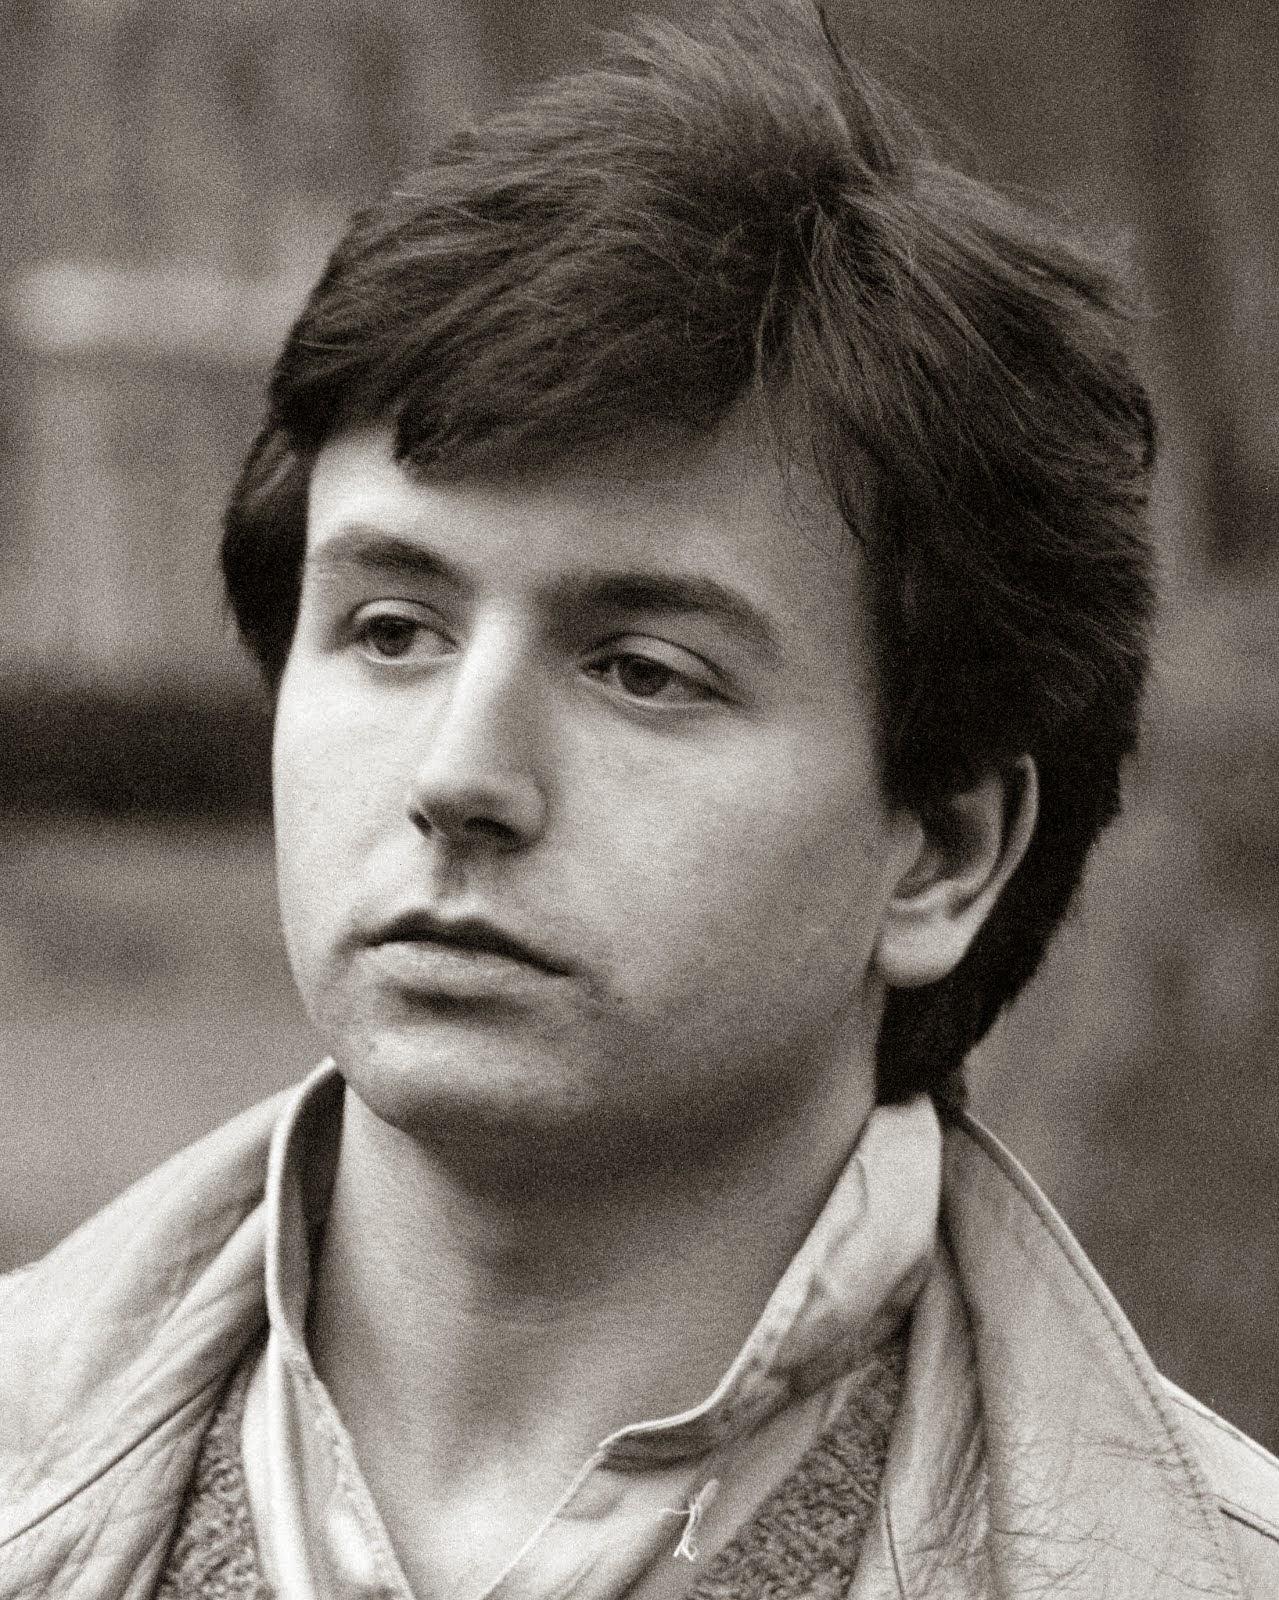 1981 Head shot